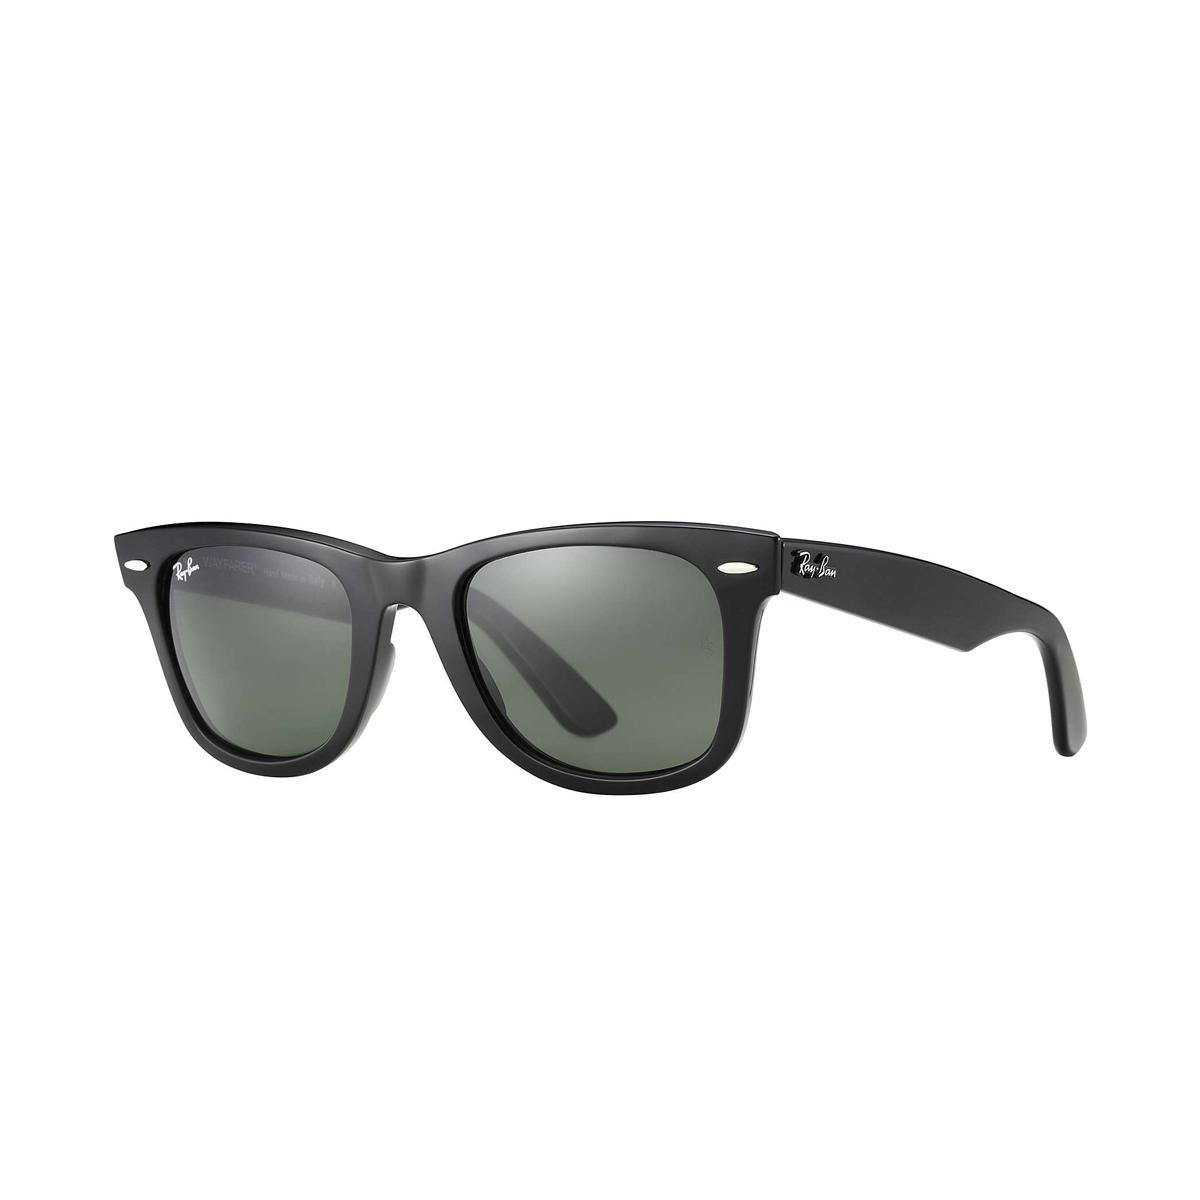 065a931c53fb3 Óculos de Sol Ray-Ban Original Wayfarer Clássico - Preto - Compre Agora